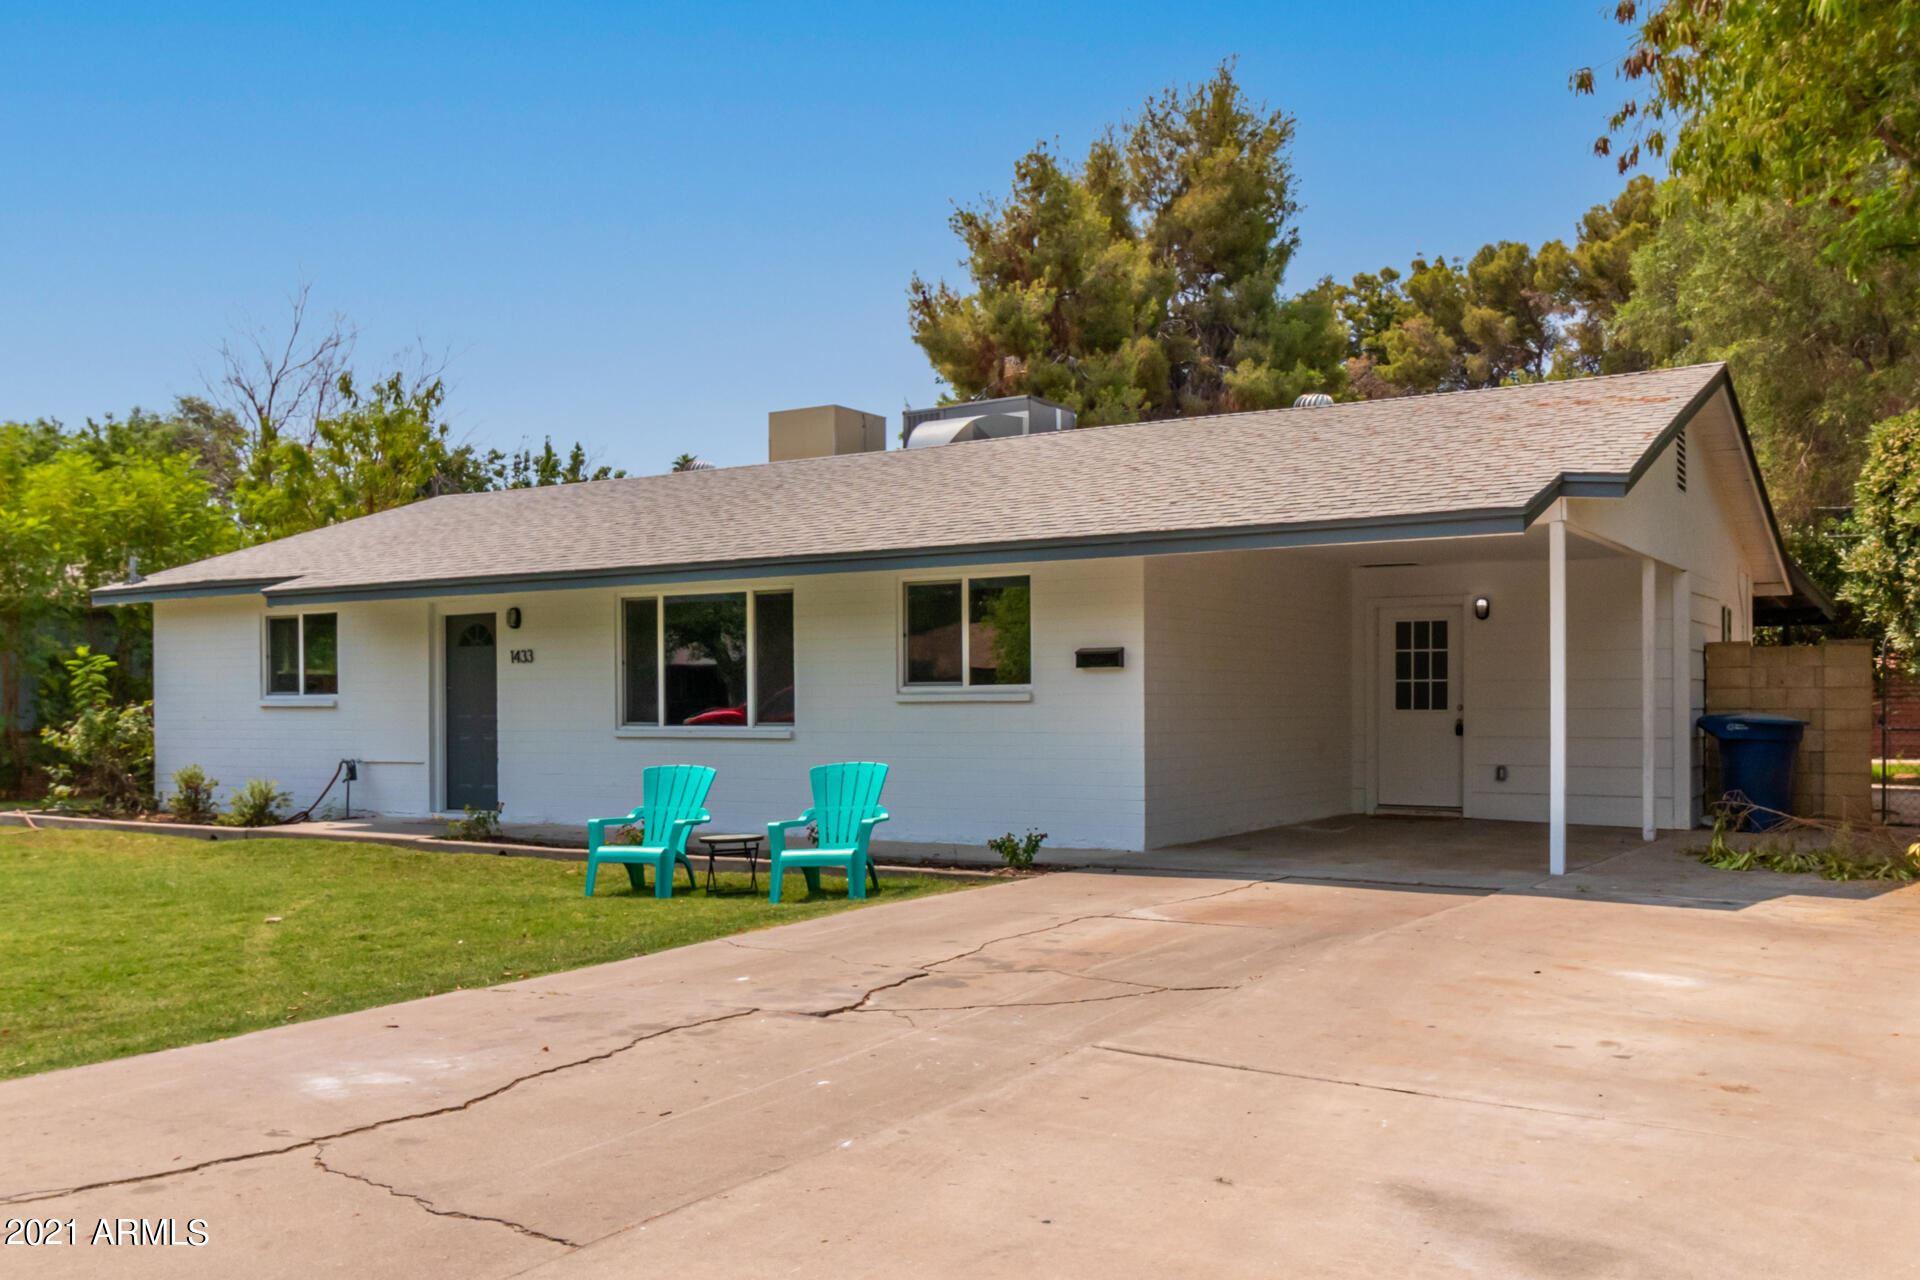 1433 E WILLIAMS Street, Tempe, AZ 85281 - MLS#: 6229458